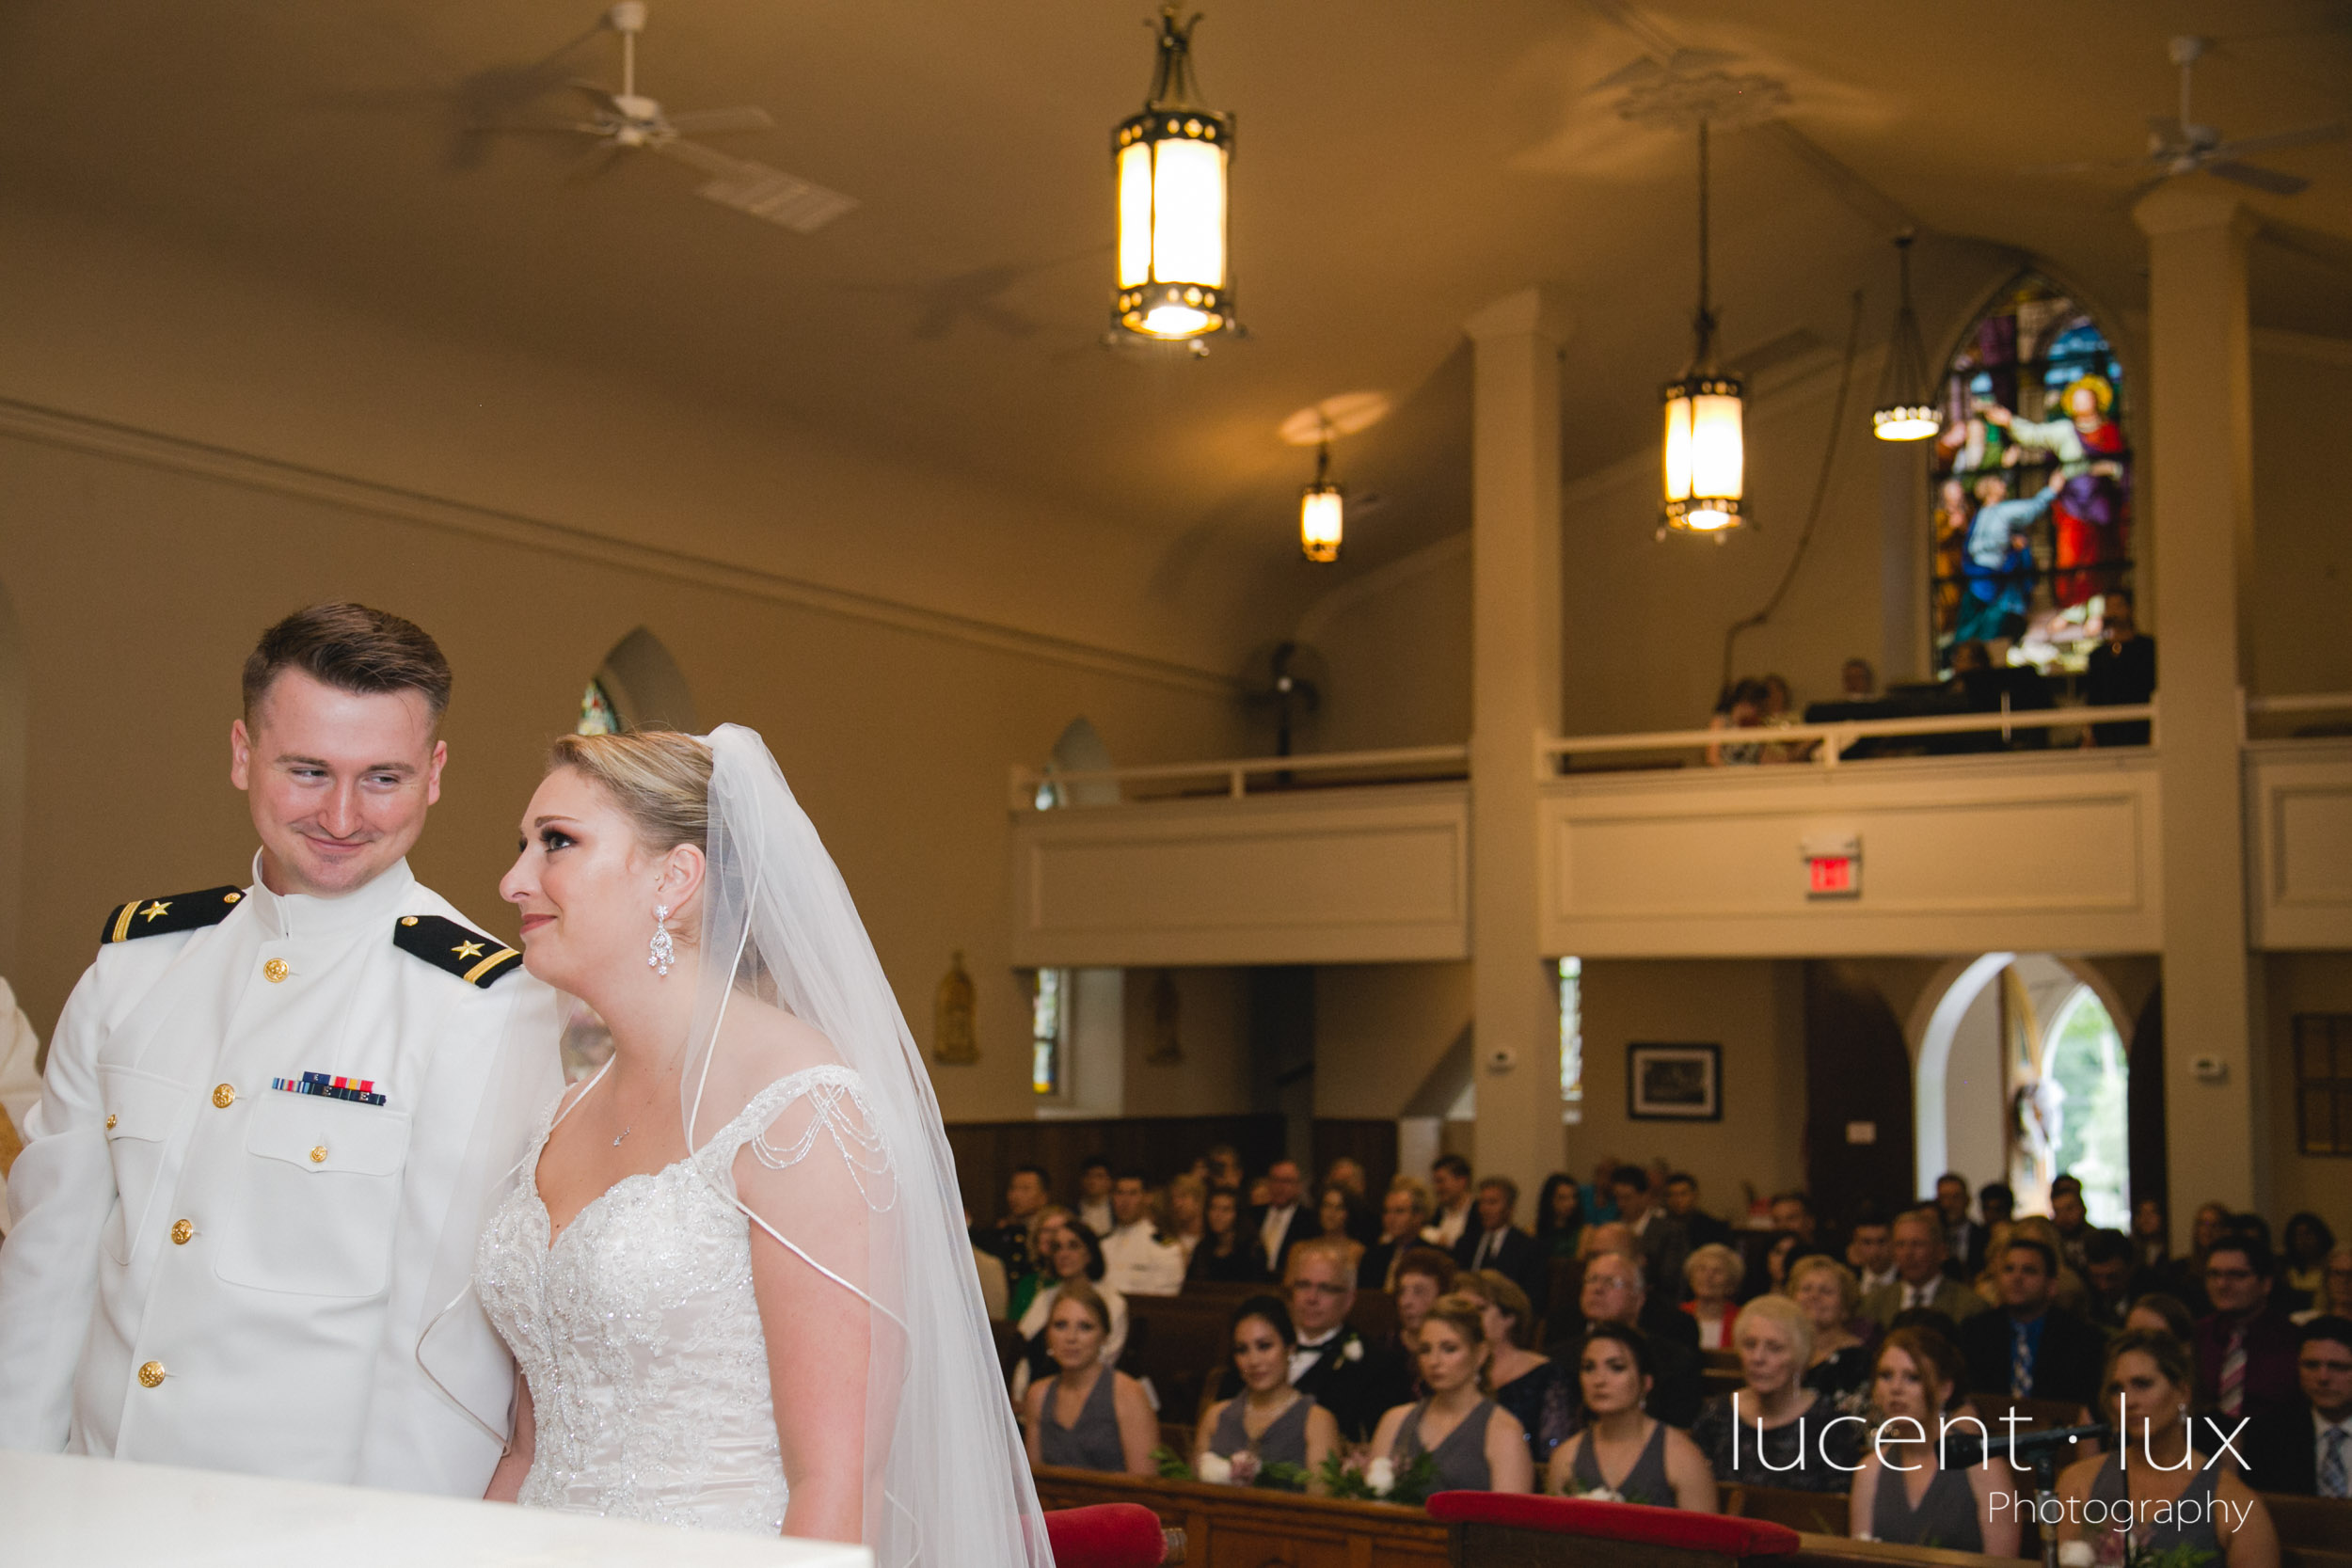 Wedding-Photography-Maryland-Pennsylvania-Photographer-Mendenhall-Inn-Media-Portrait-Event-126.jpg